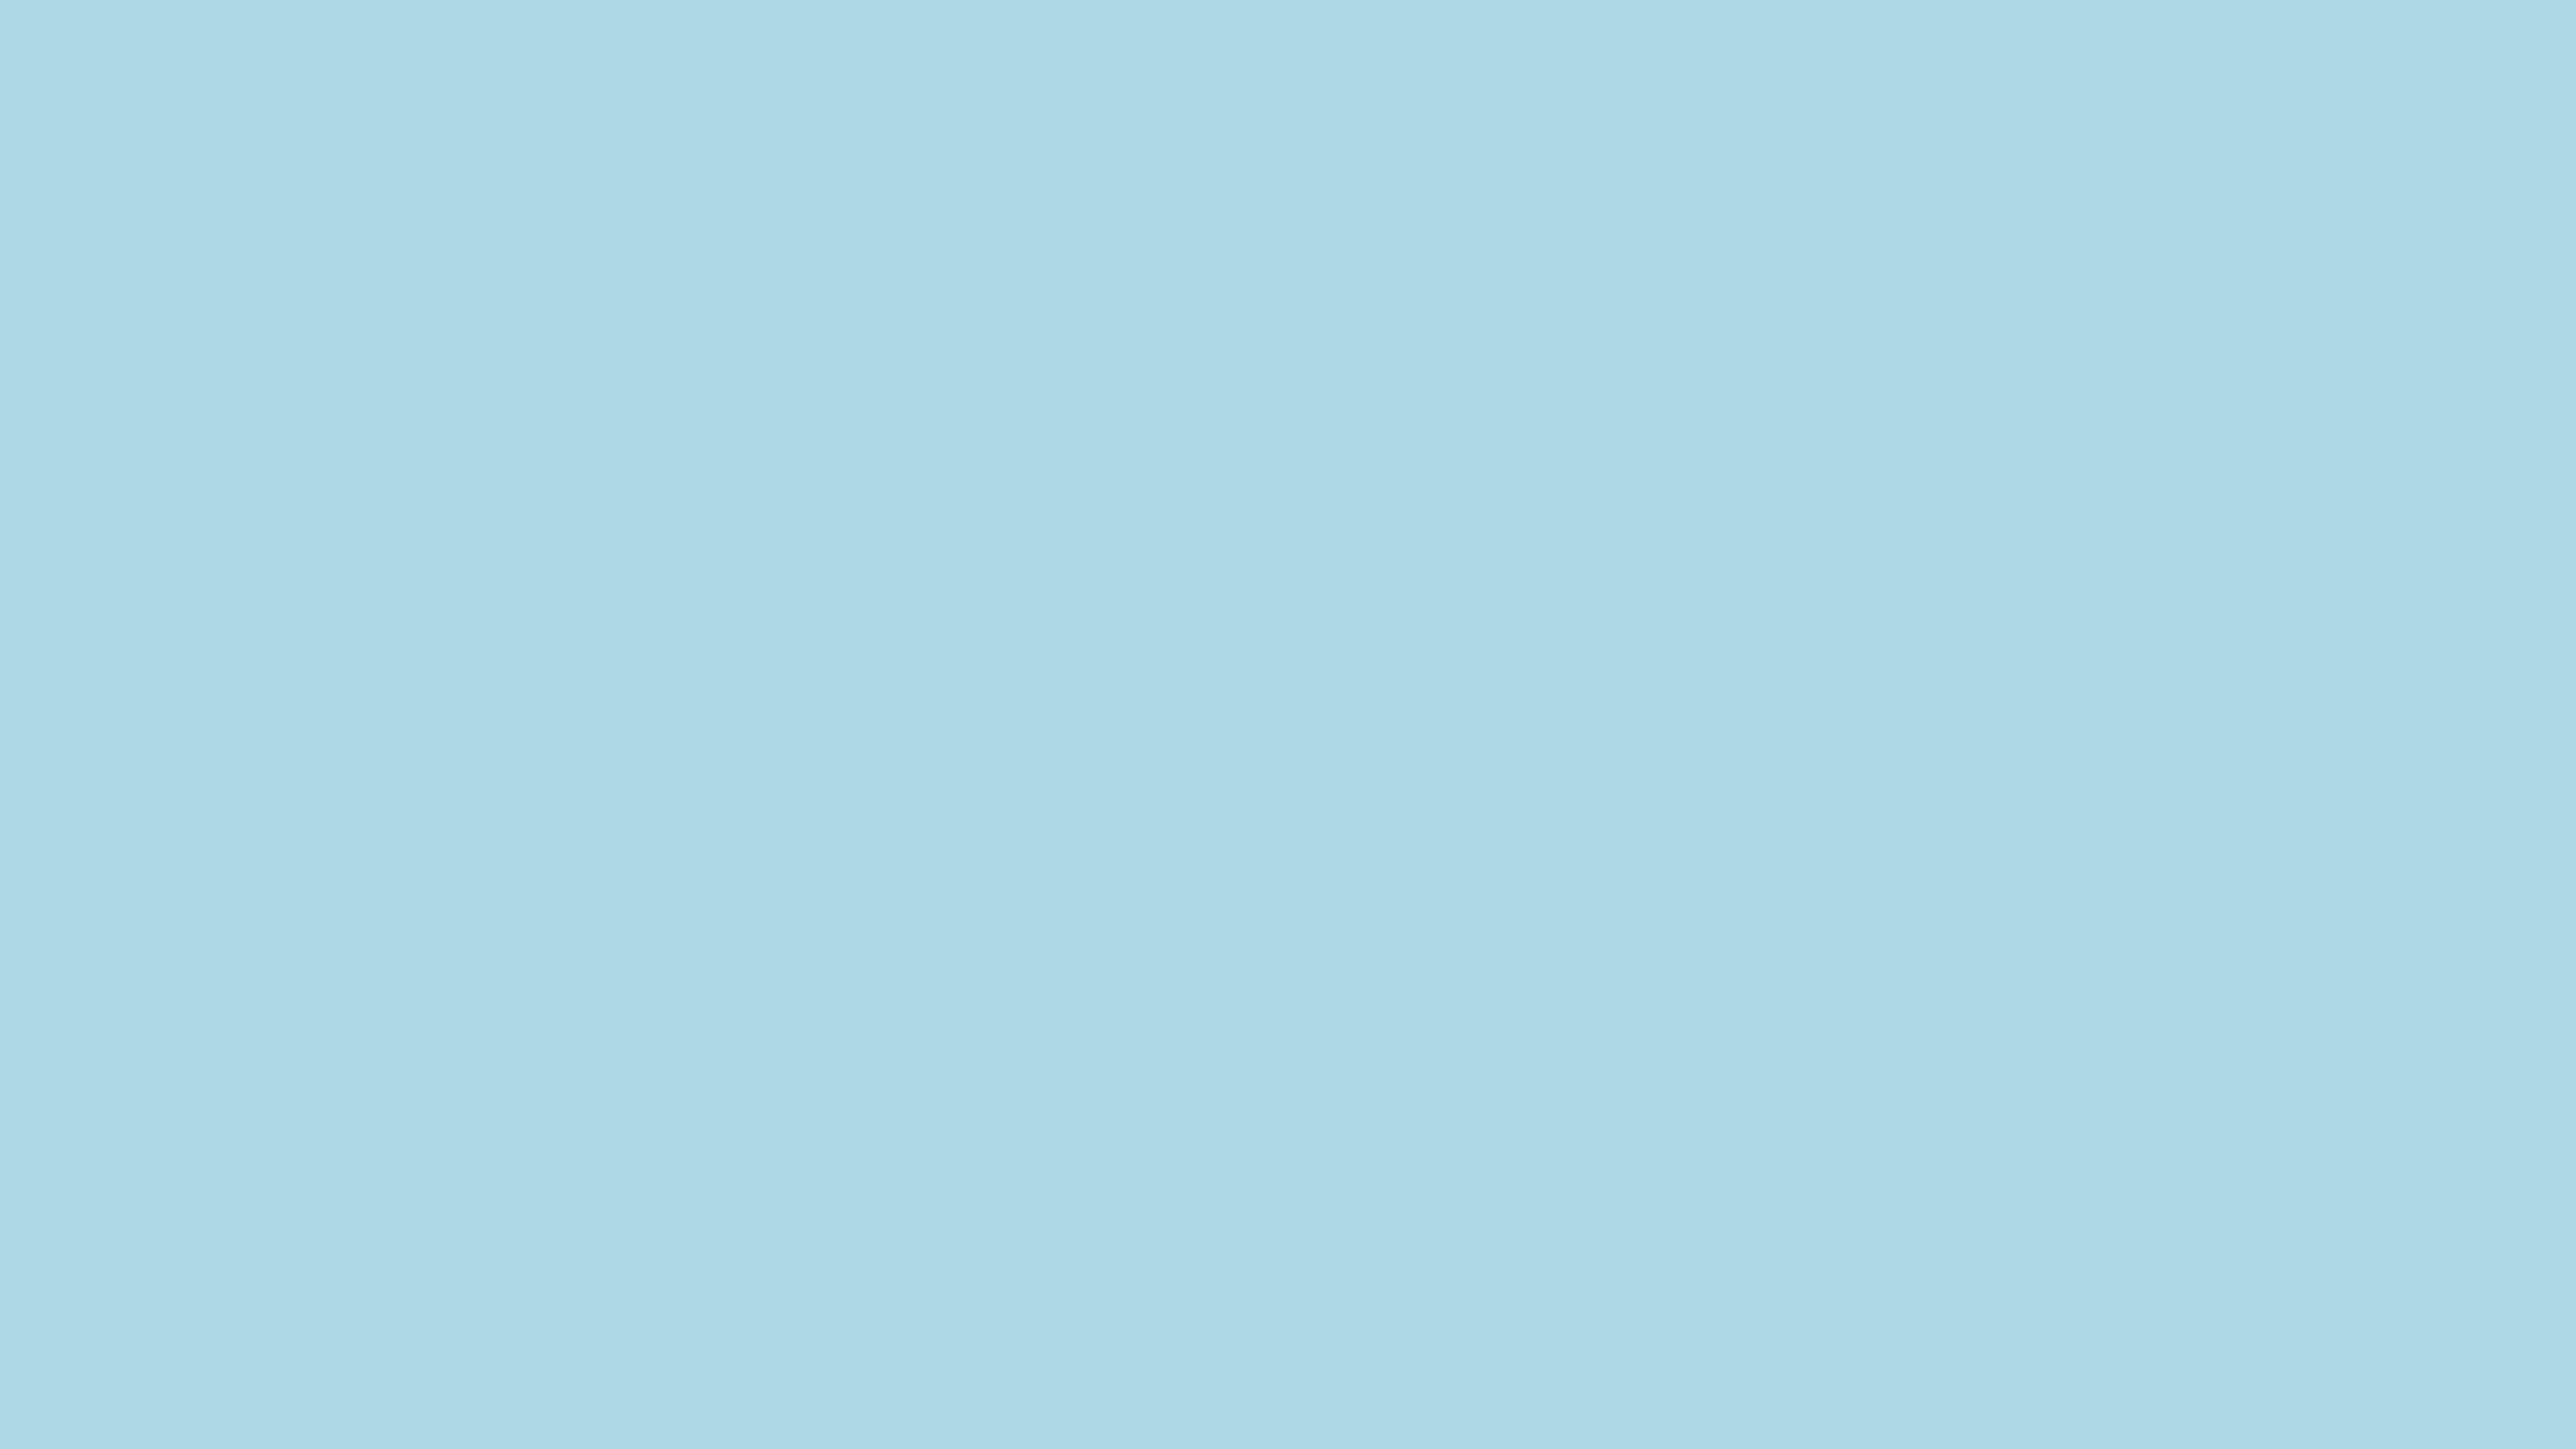 4096x2304 Light Blue Solid Color Background